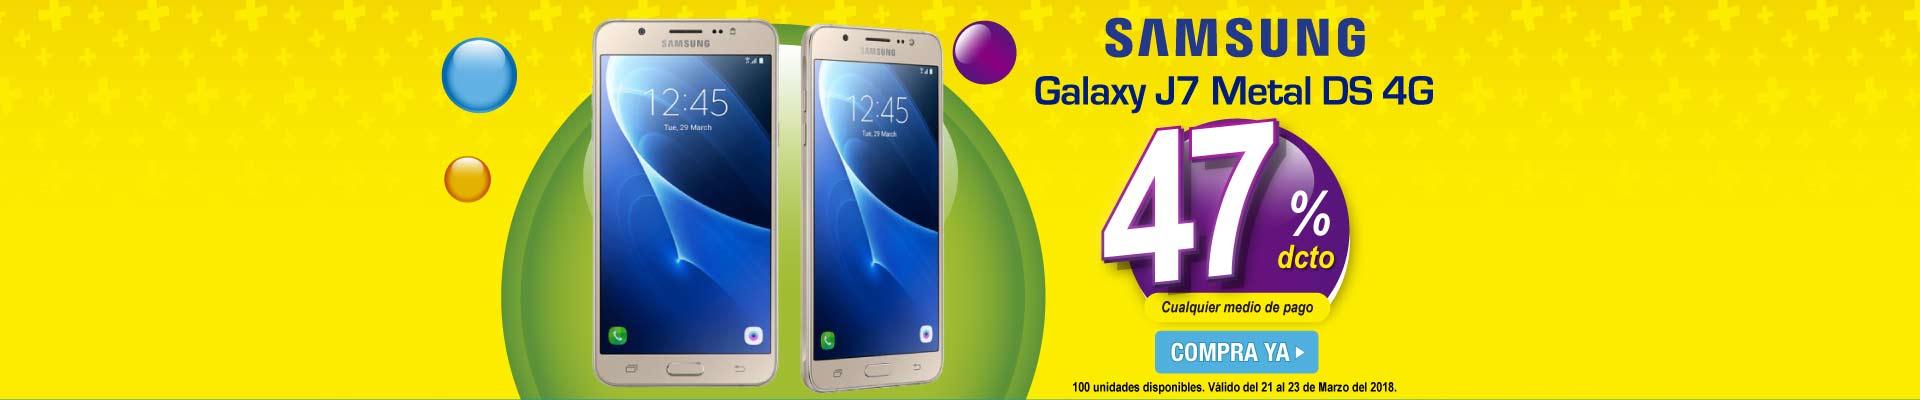 PPAL ALKP-1-celulares-Celular SAMSUNG Galaxy J7 Metal DS 4G-prod-Marzo21-23